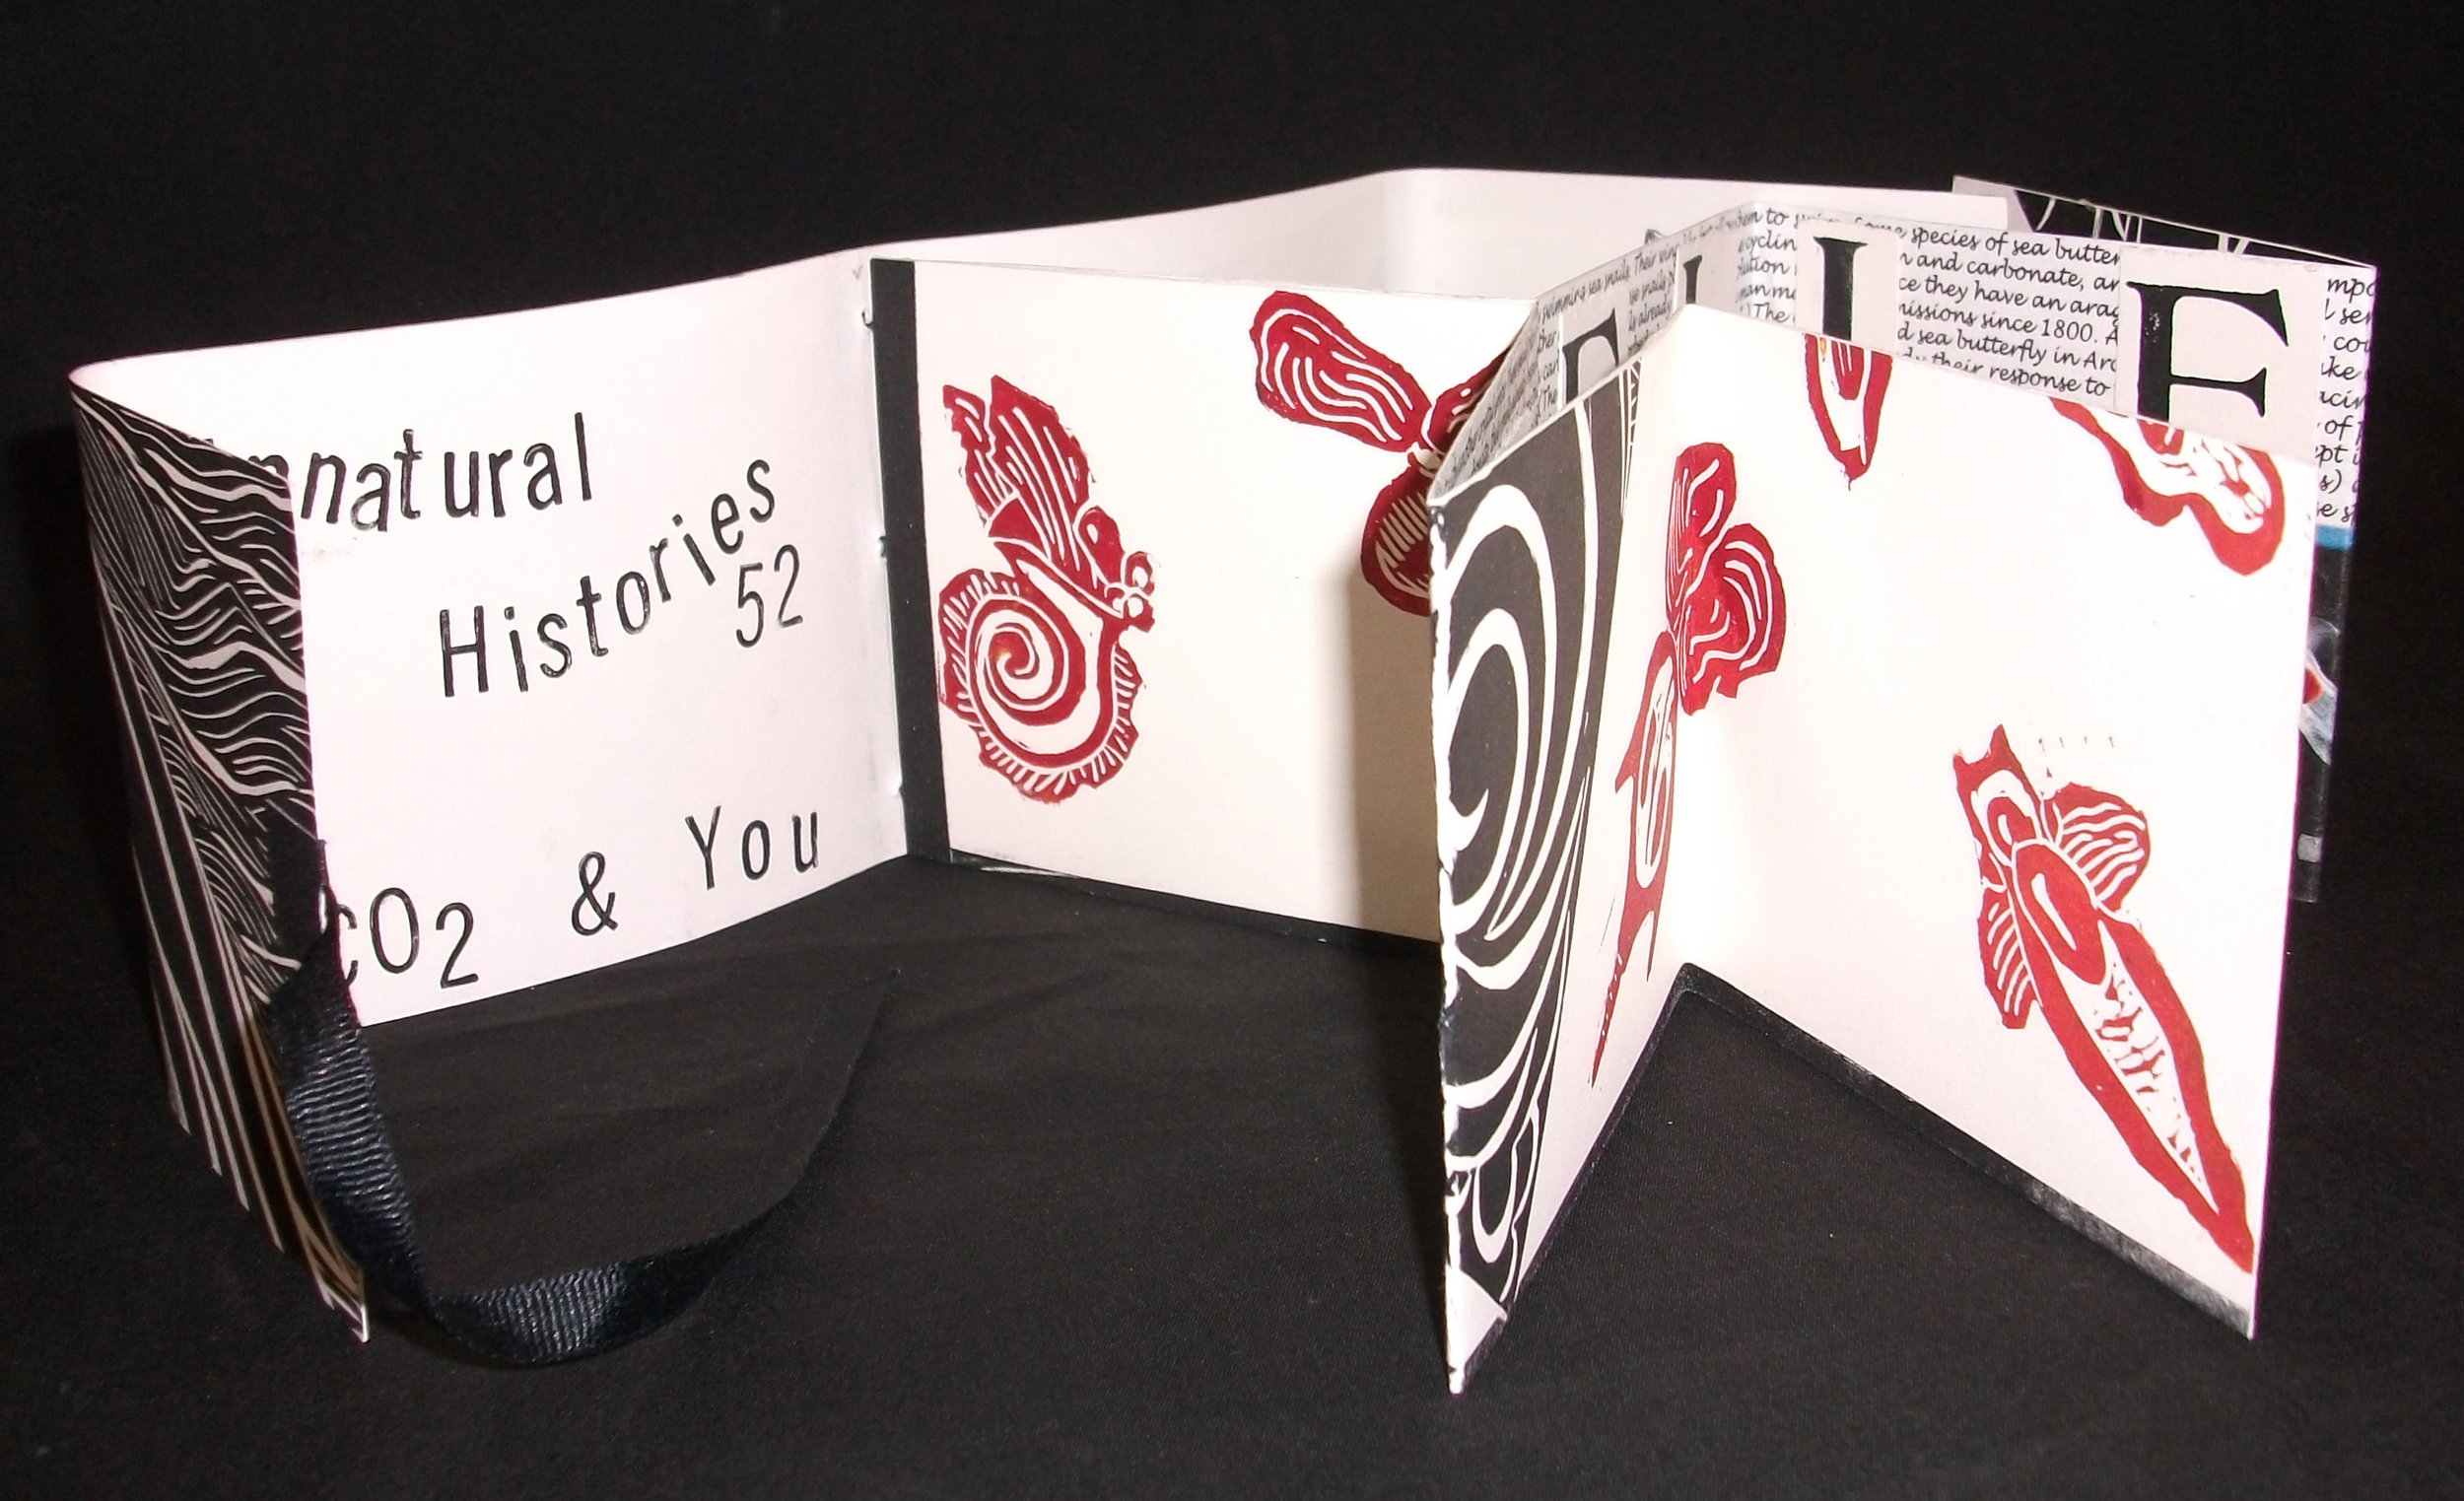 Unnatural Histories 42, Barbara Milman, Collage, Digital, Linocut, Type, California, 2010